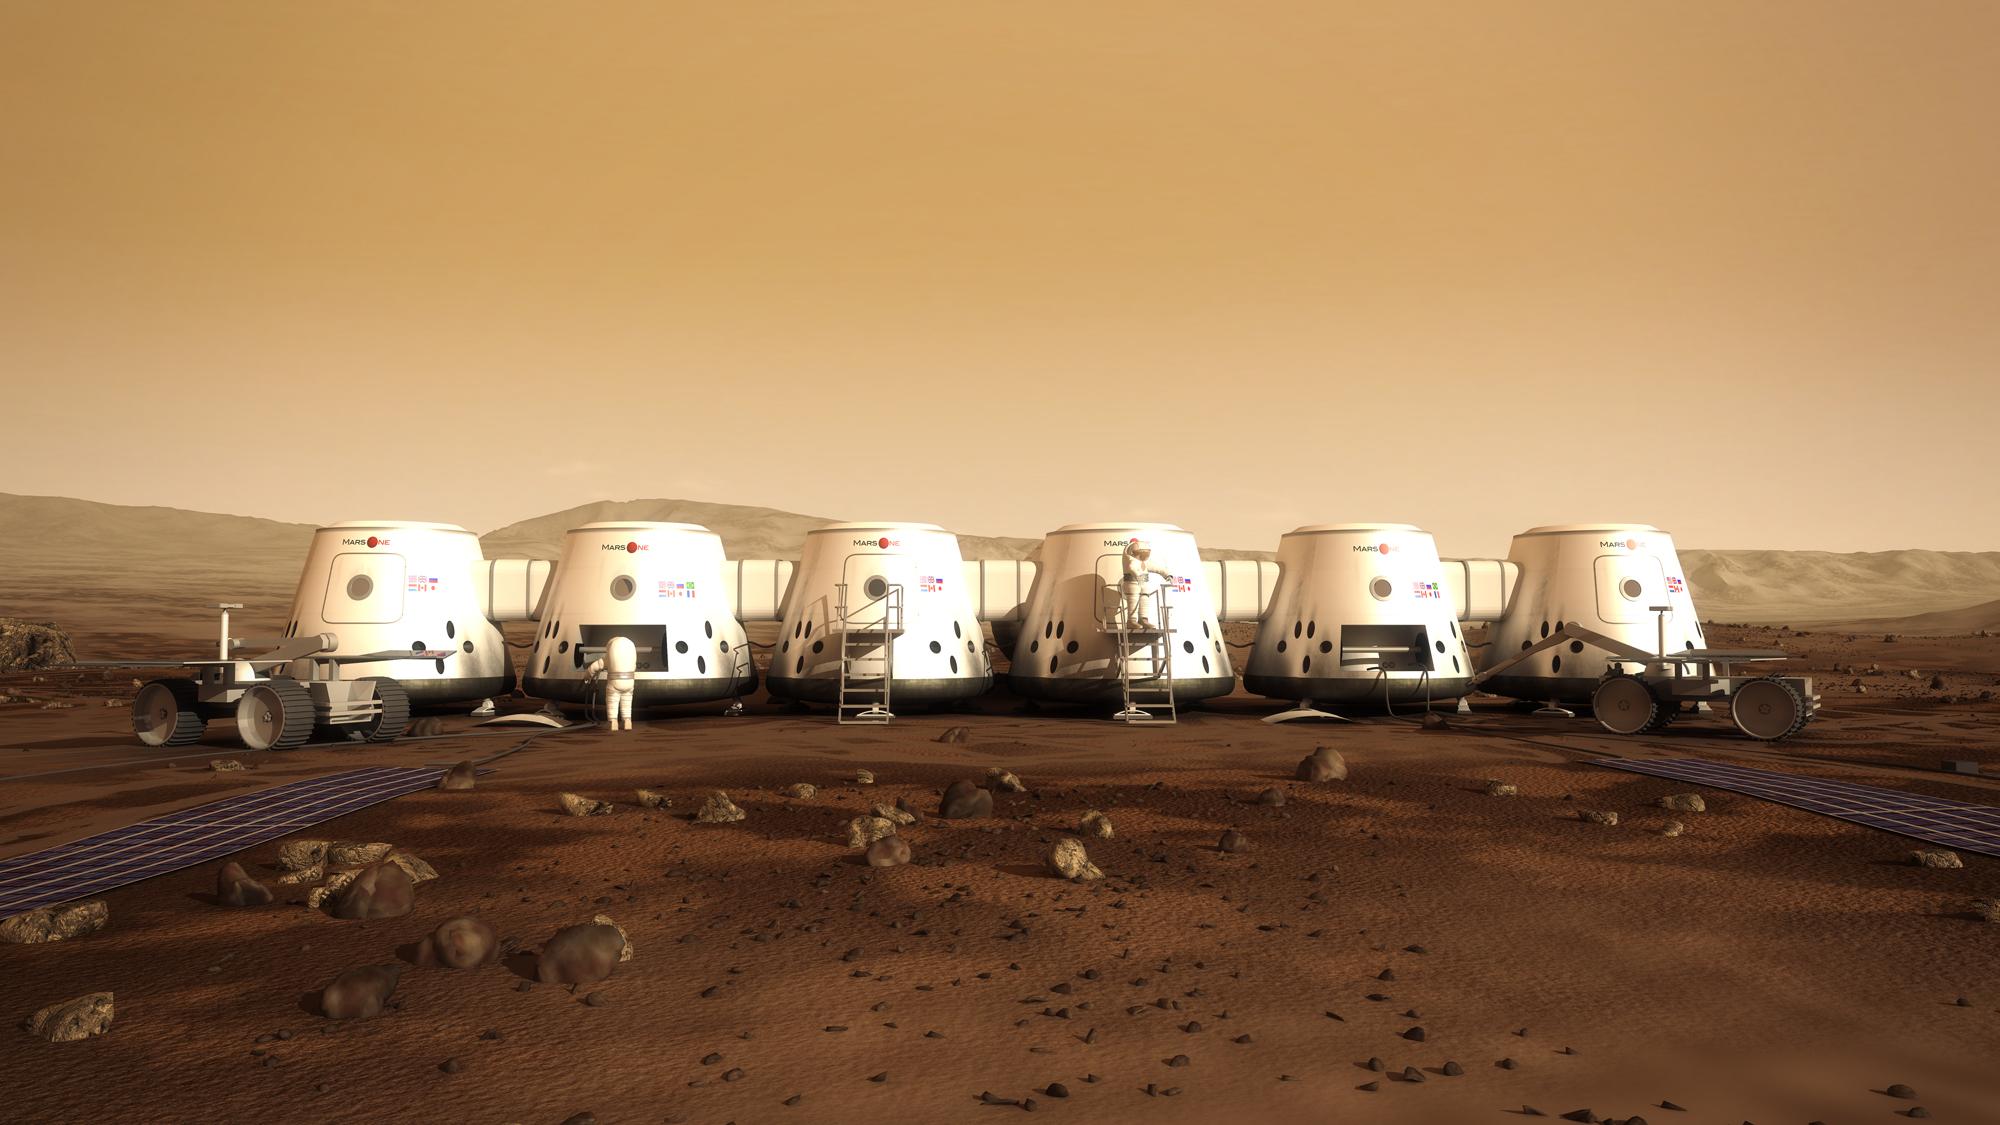 travel to mars 2023 - photo #4